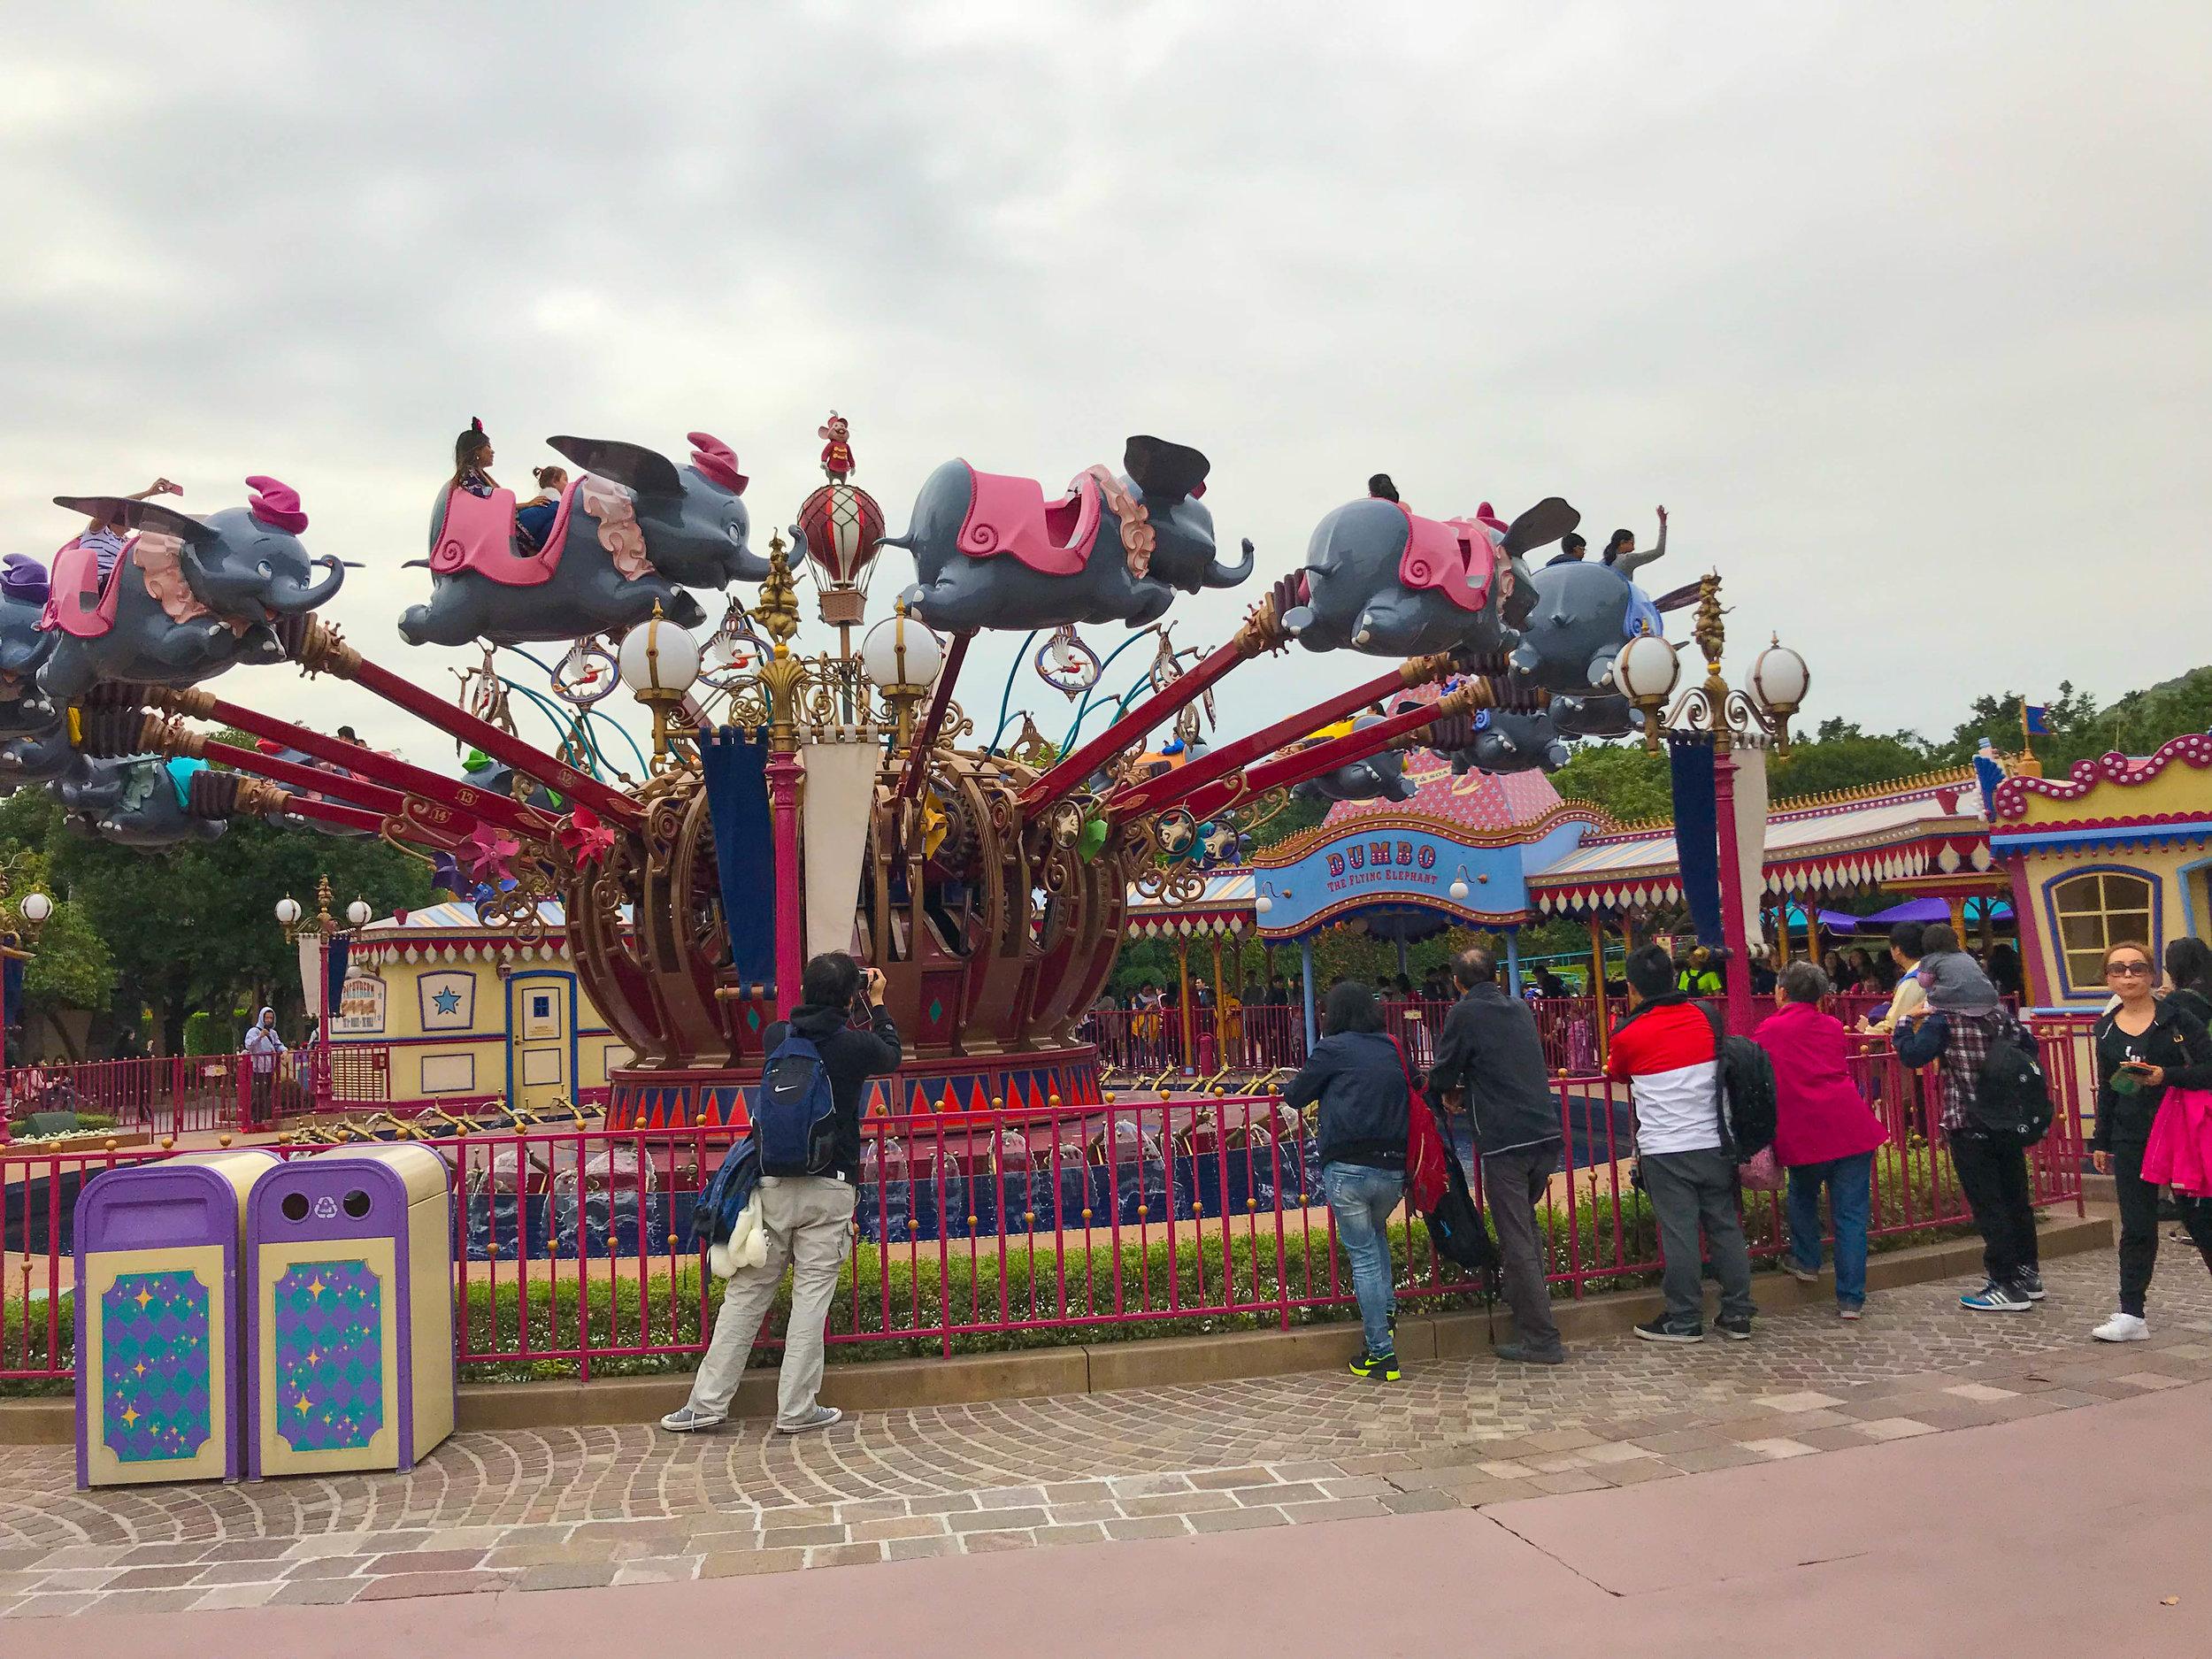 Hong Kong Disneyland - Fantasyland Dumbo